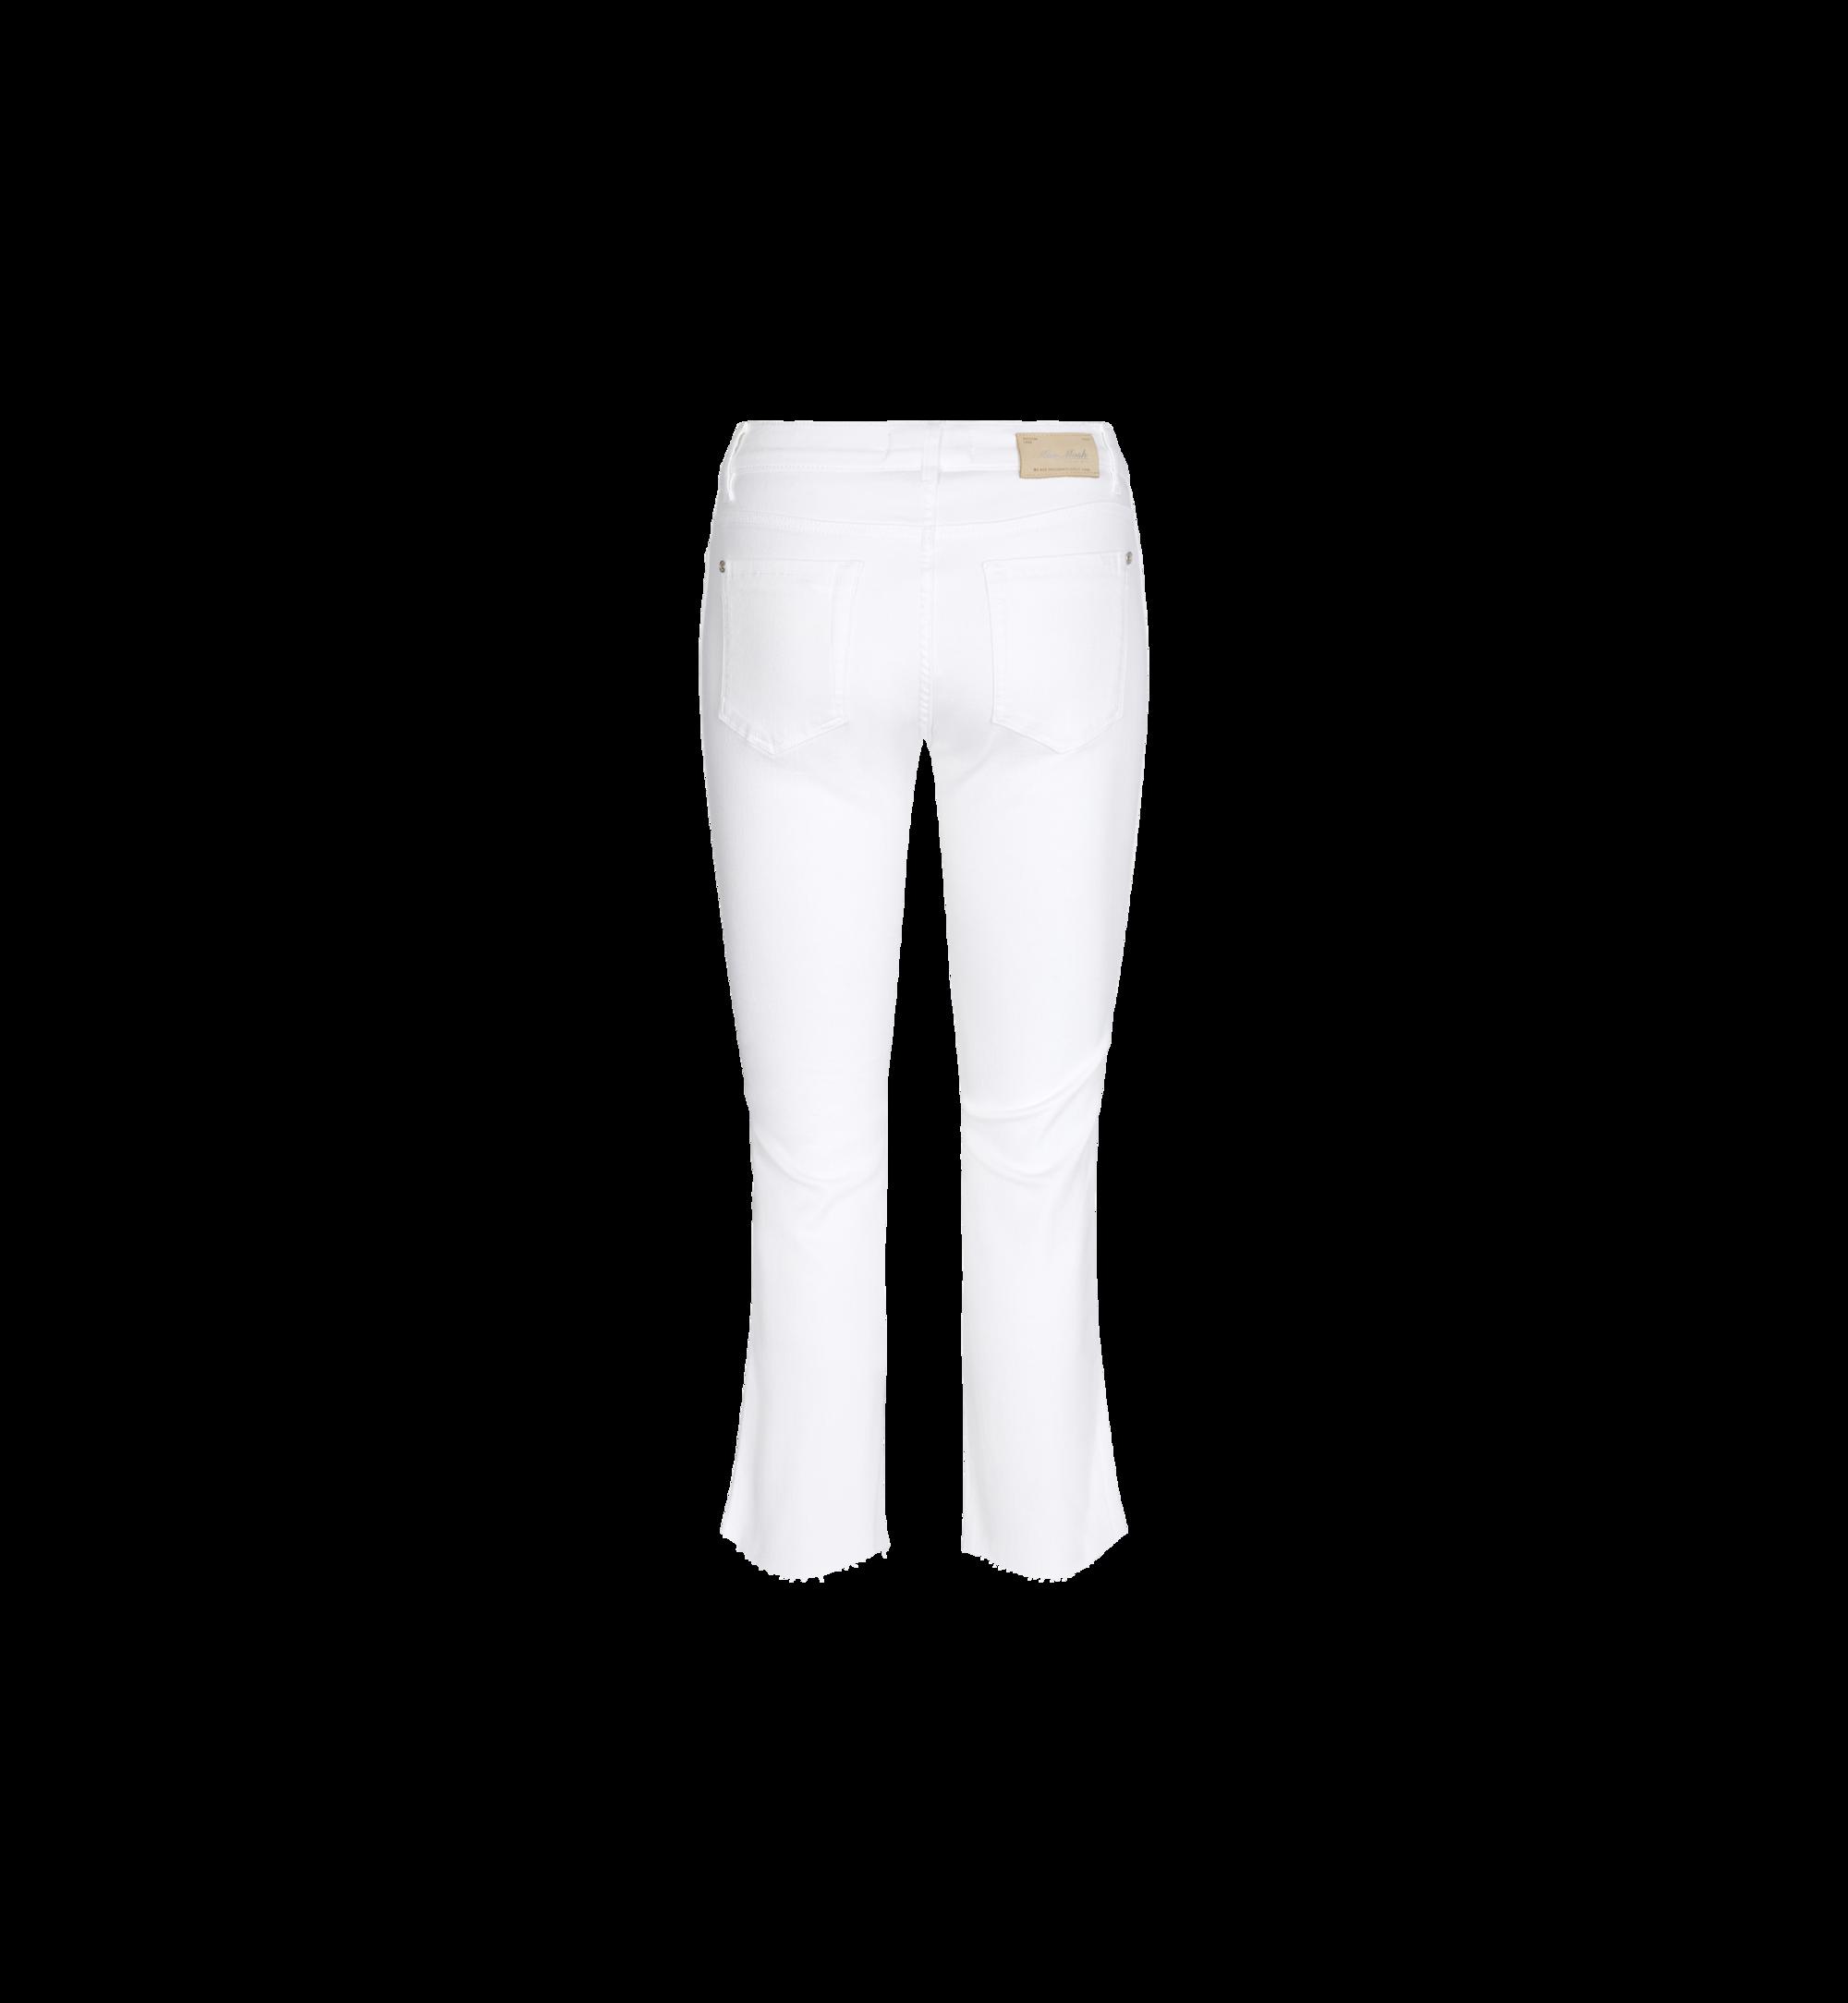 HS20-133580-101_2.Ashley_White_Jeans-White_2000x